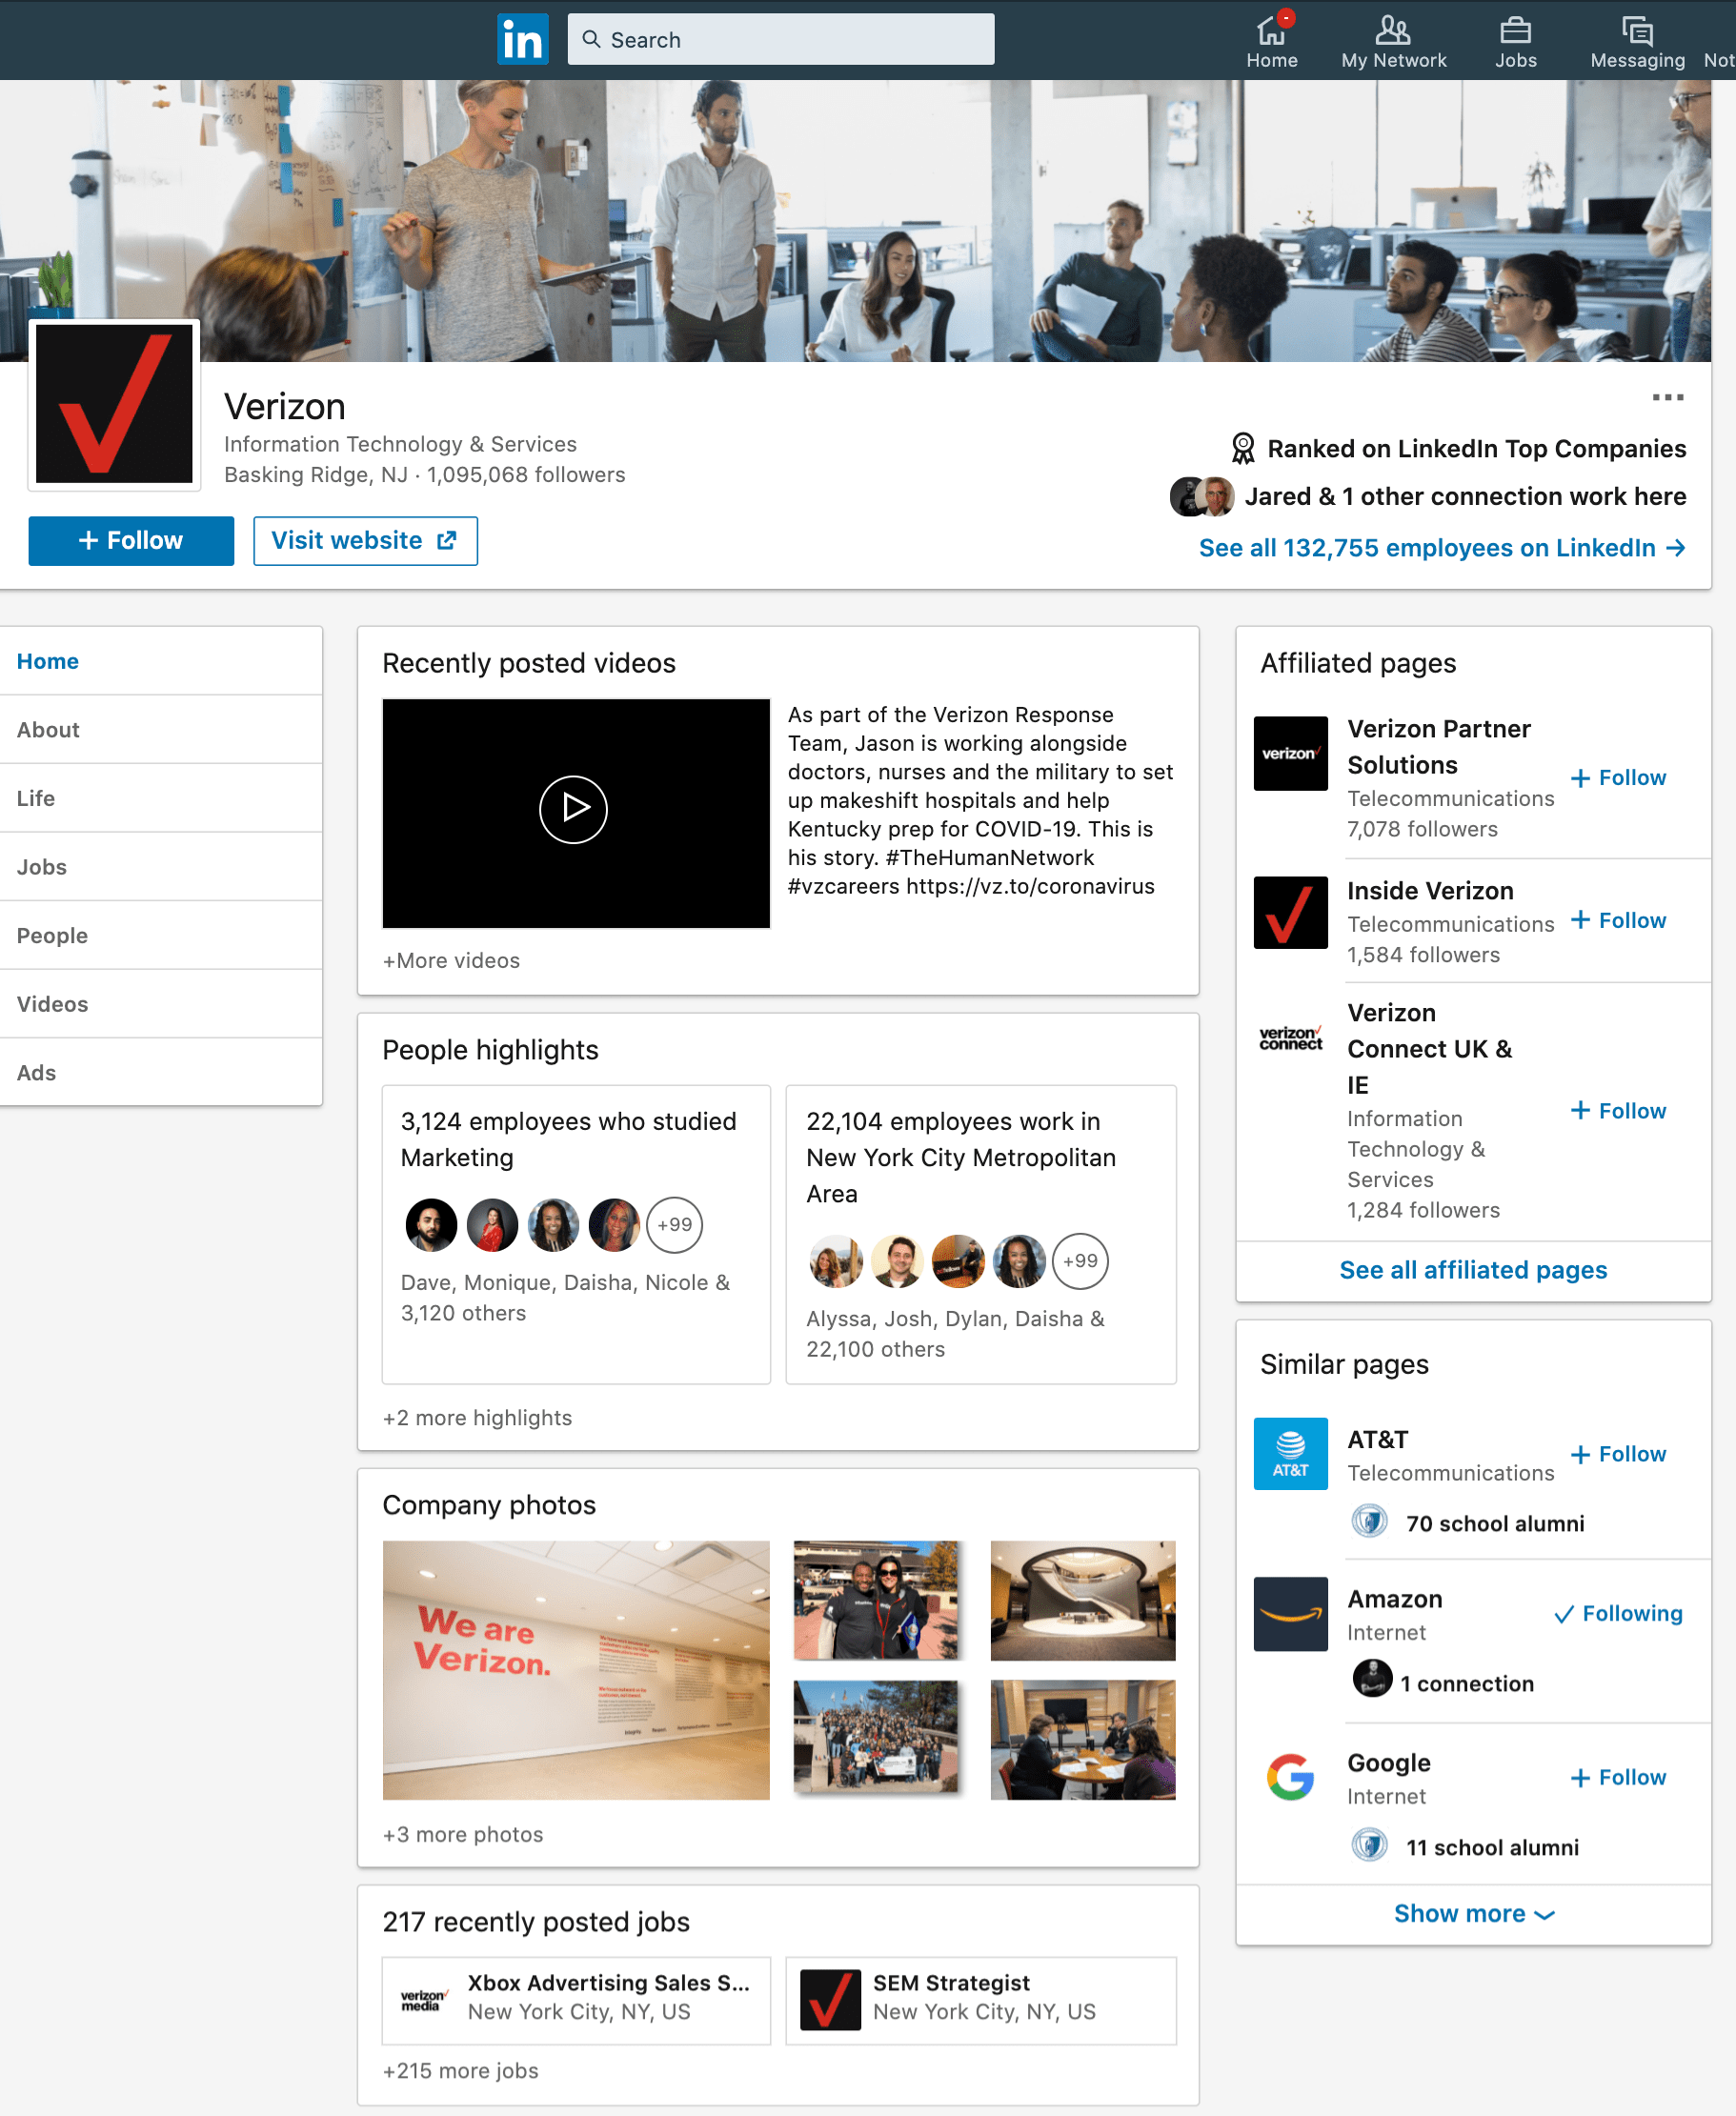 Verizon_Overview_LinkedIn